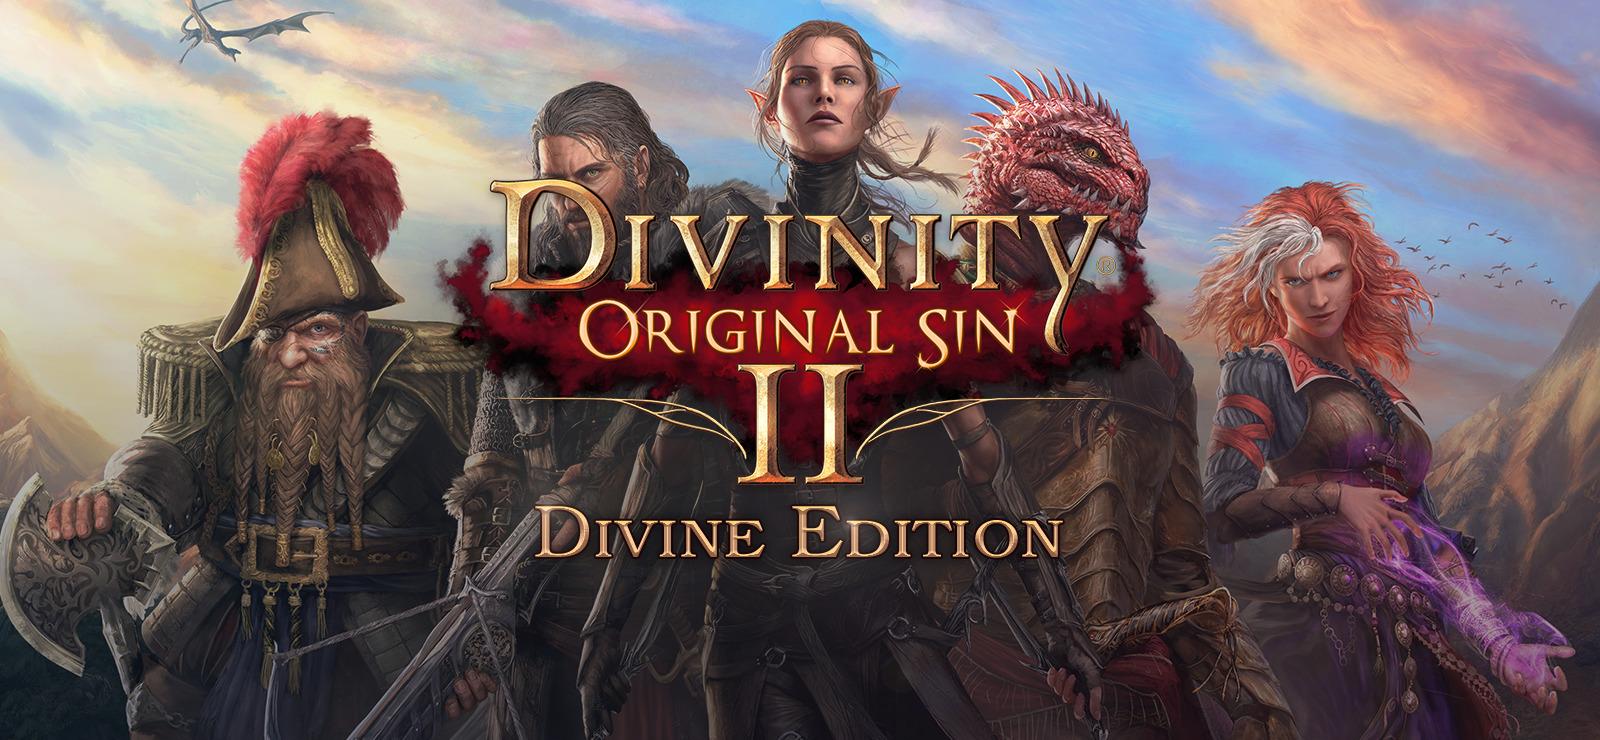 divinity-original-sin-2-divine-edition-pc-cover